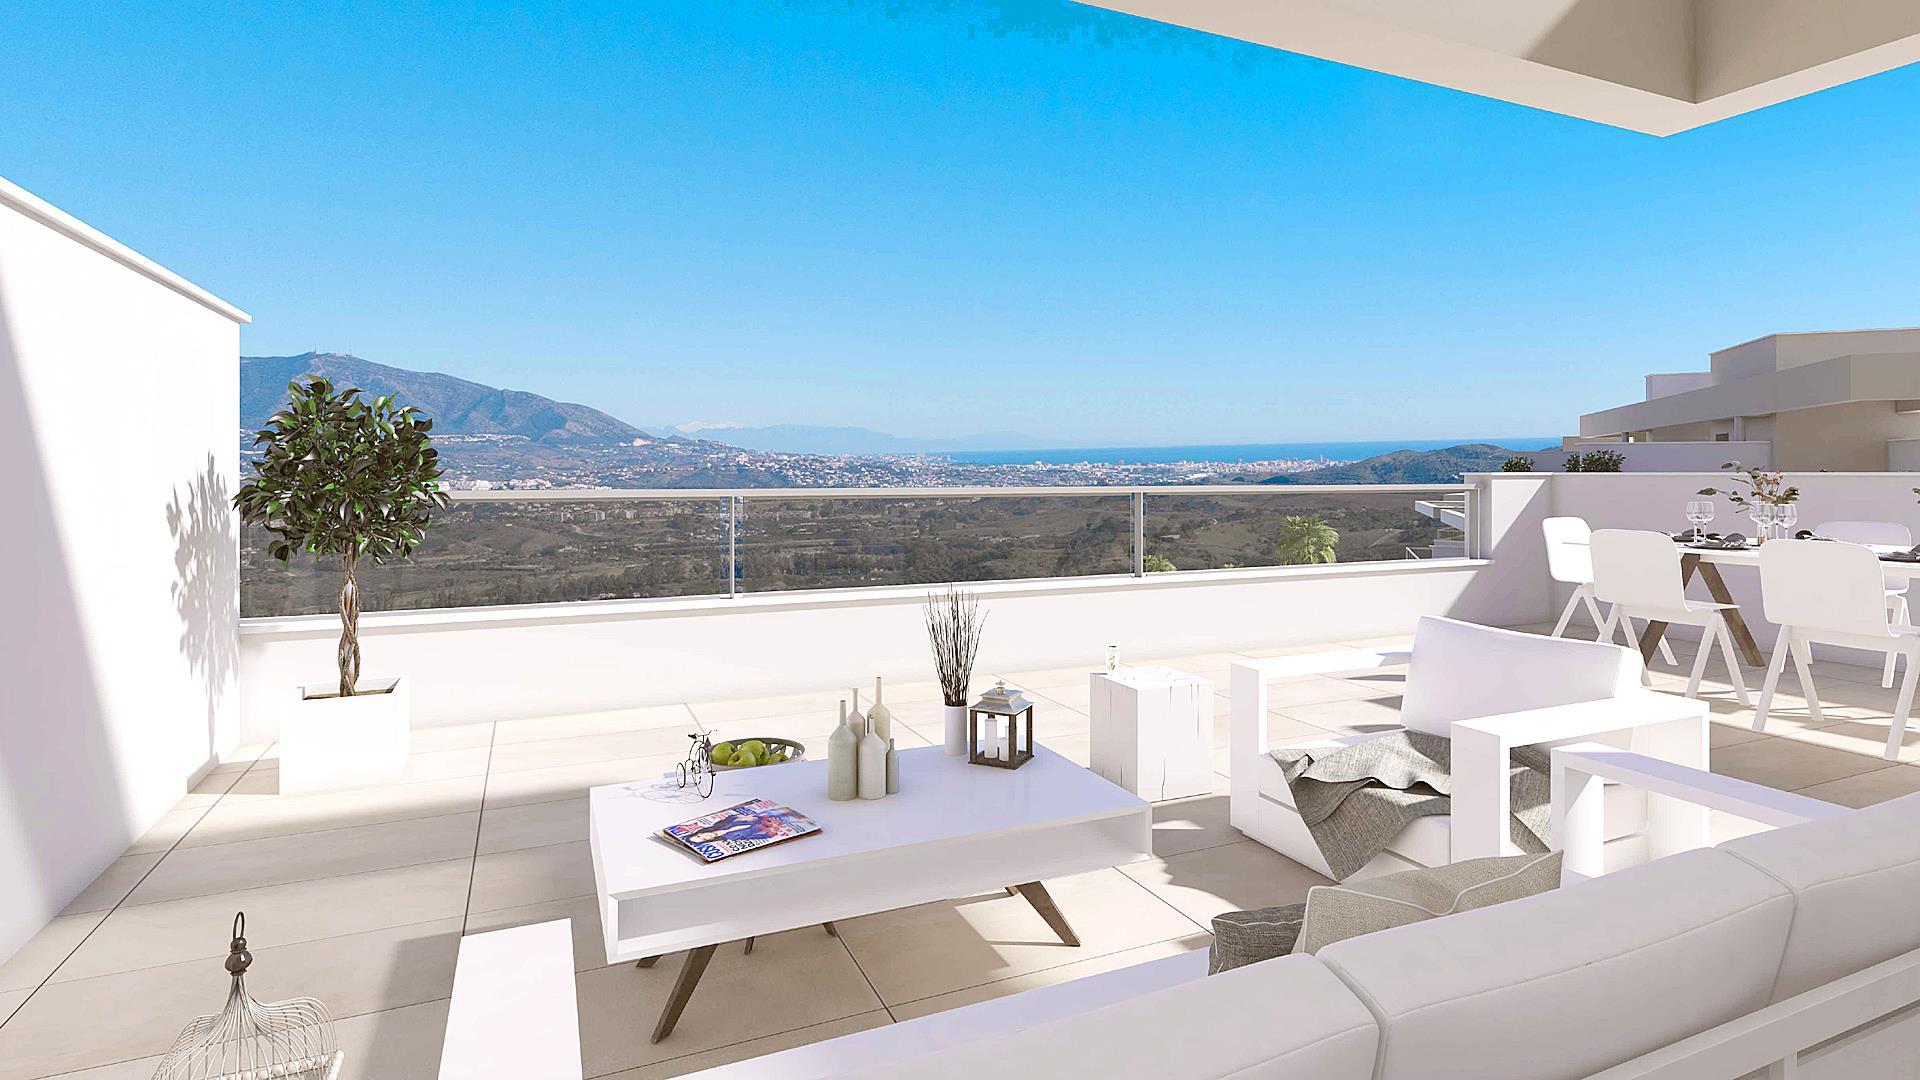 Appartements en vente à La Cala Golf MCO8033998